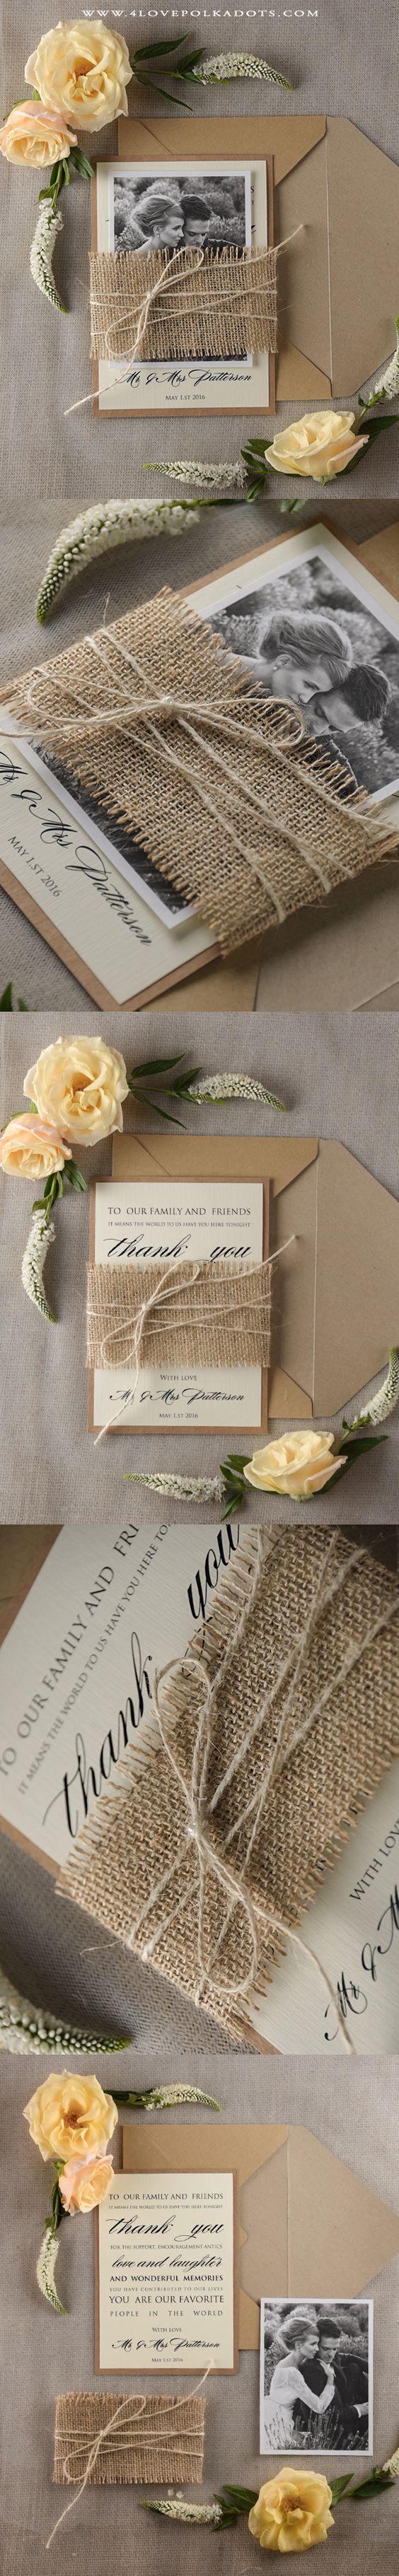 Rustic Wedding Thank You Card - Burlap & Twine #romanticwedding #countryweddingideas